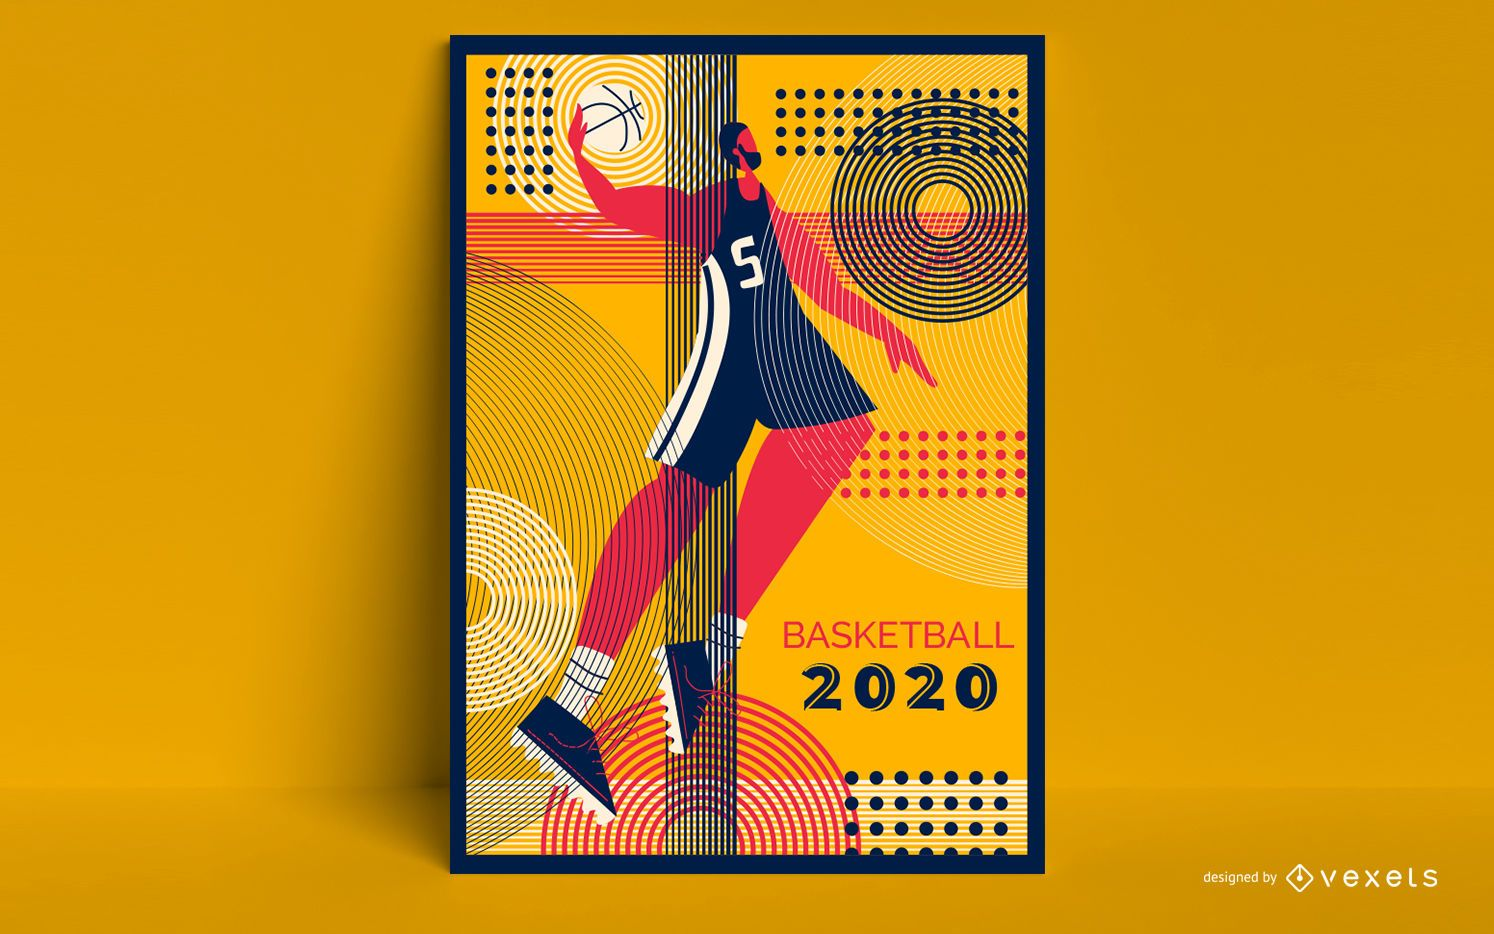 Design de pôster olímpico de basquete